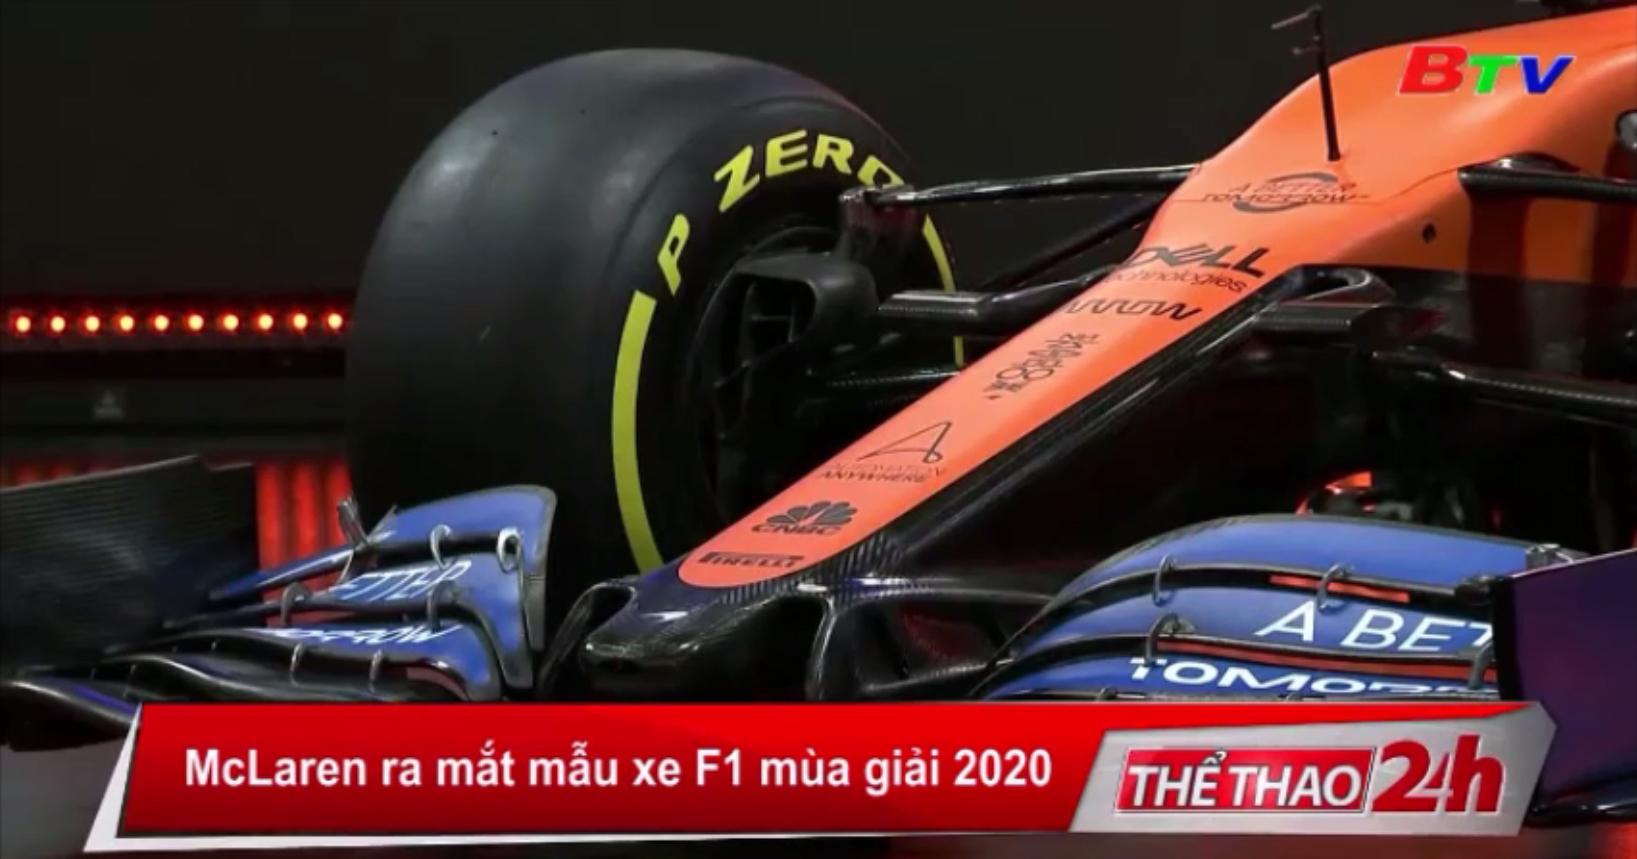 McLaren ra mắt mẫu xe F1 mùa giải 2020